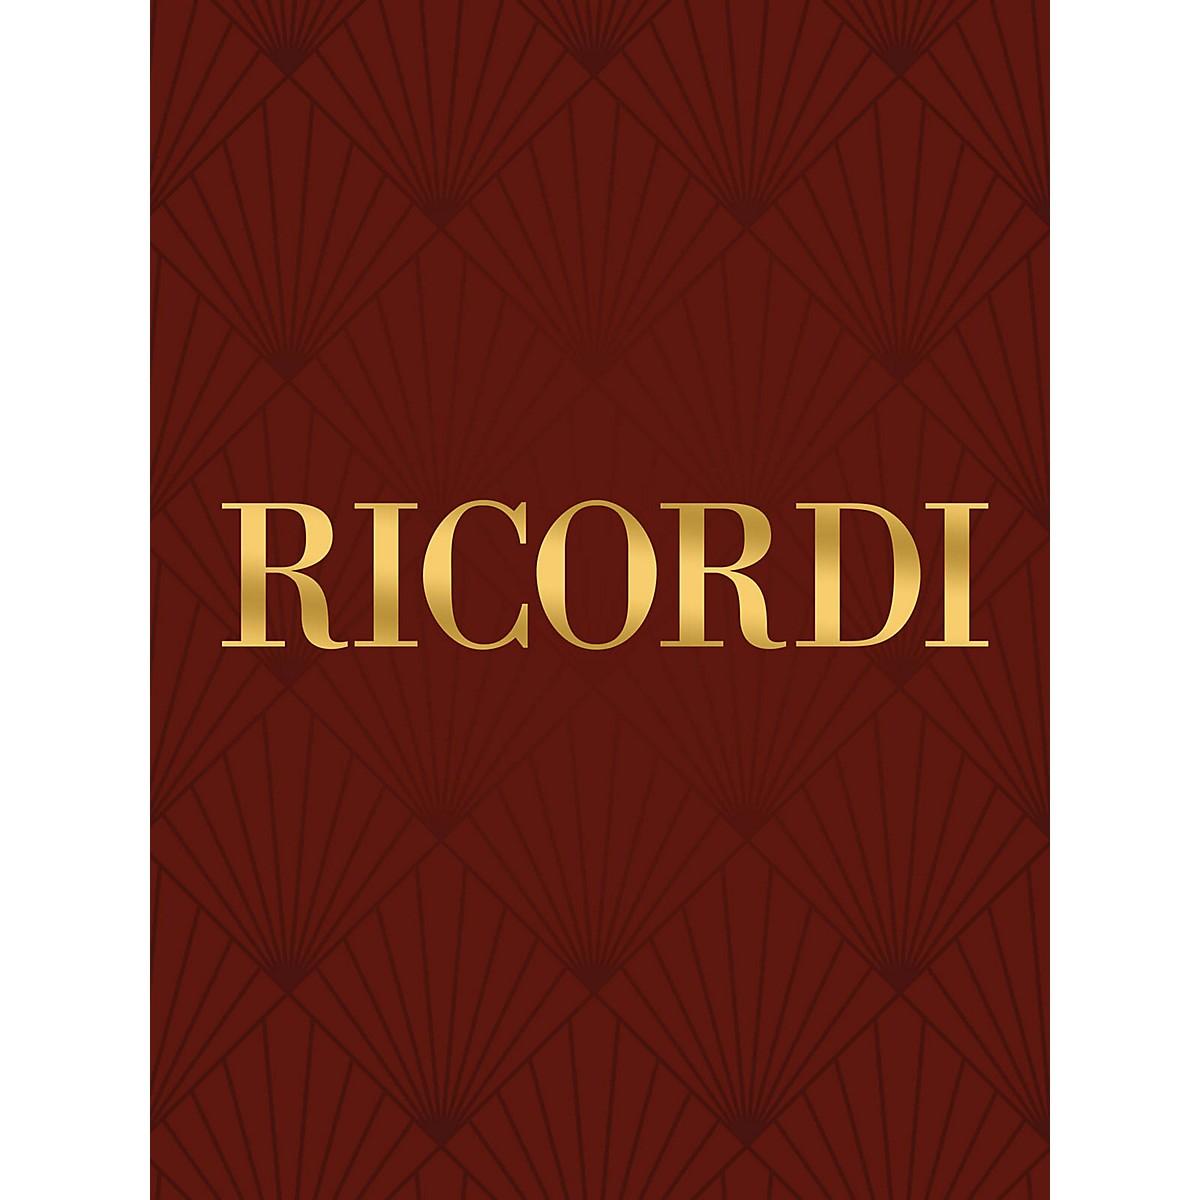 Ricordi East, Tomkins, Wilbye (Descant/treble/tenor recorders) Ricordi London Series